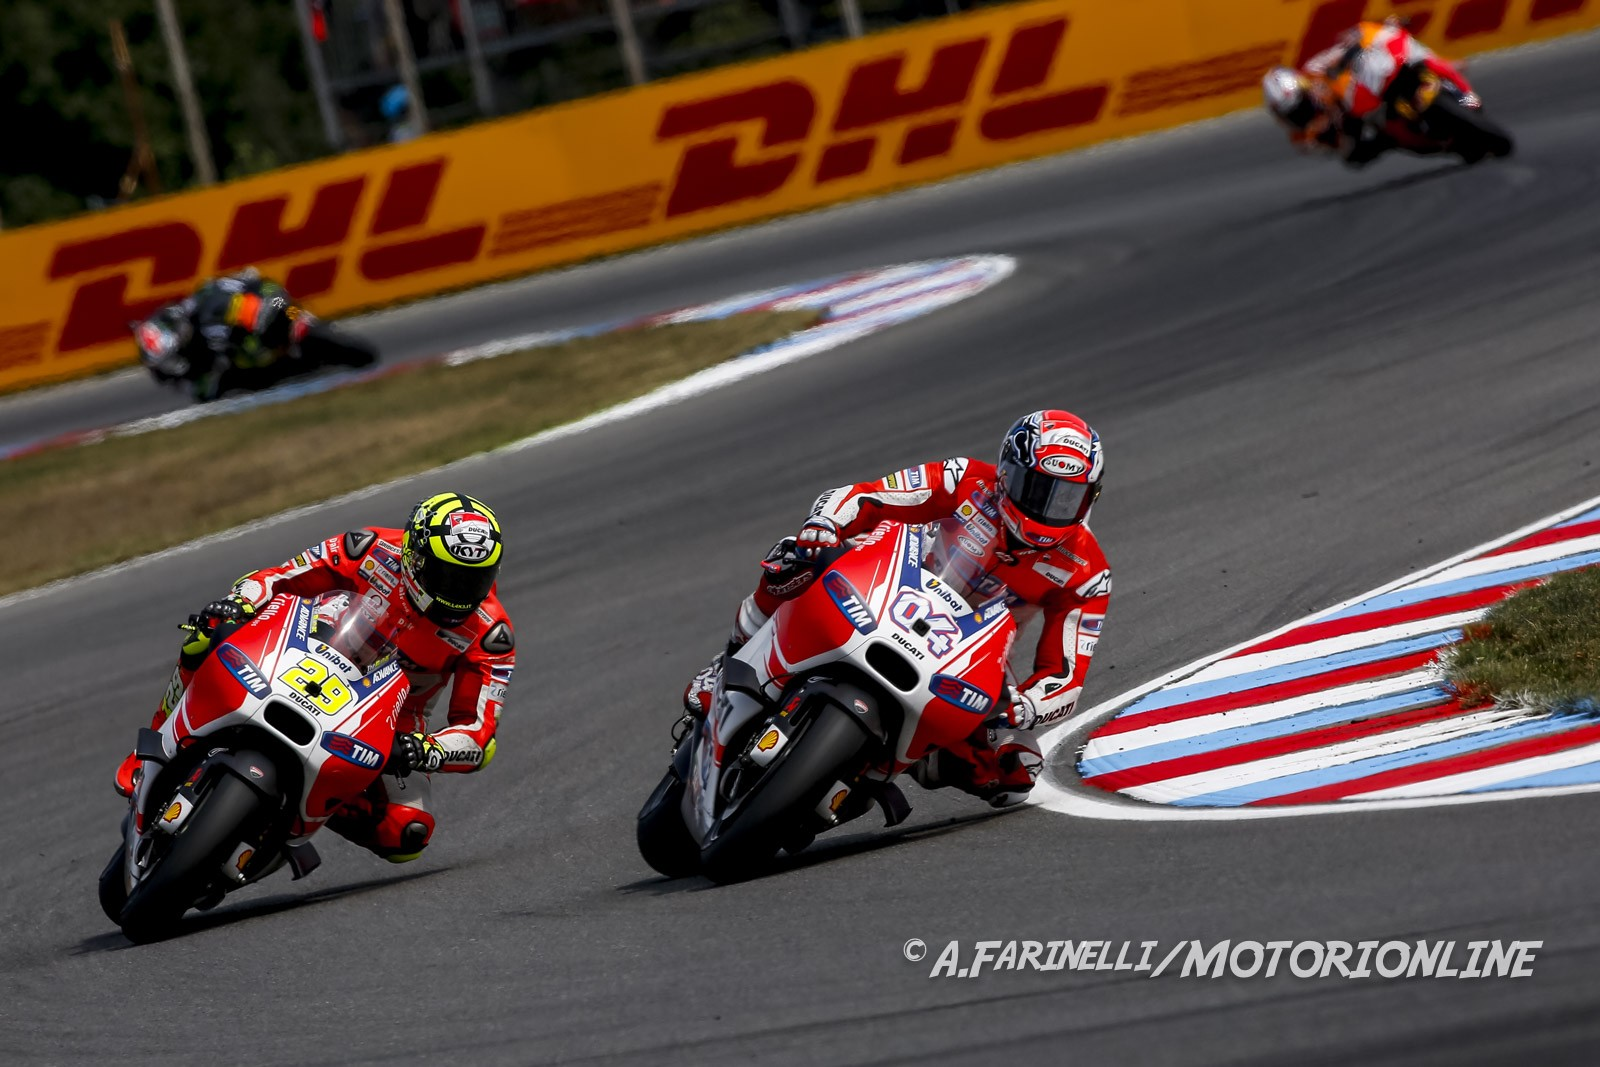 Motogp Austin Gara 2015 | MotoGP 2017 Info, Video, Points Table